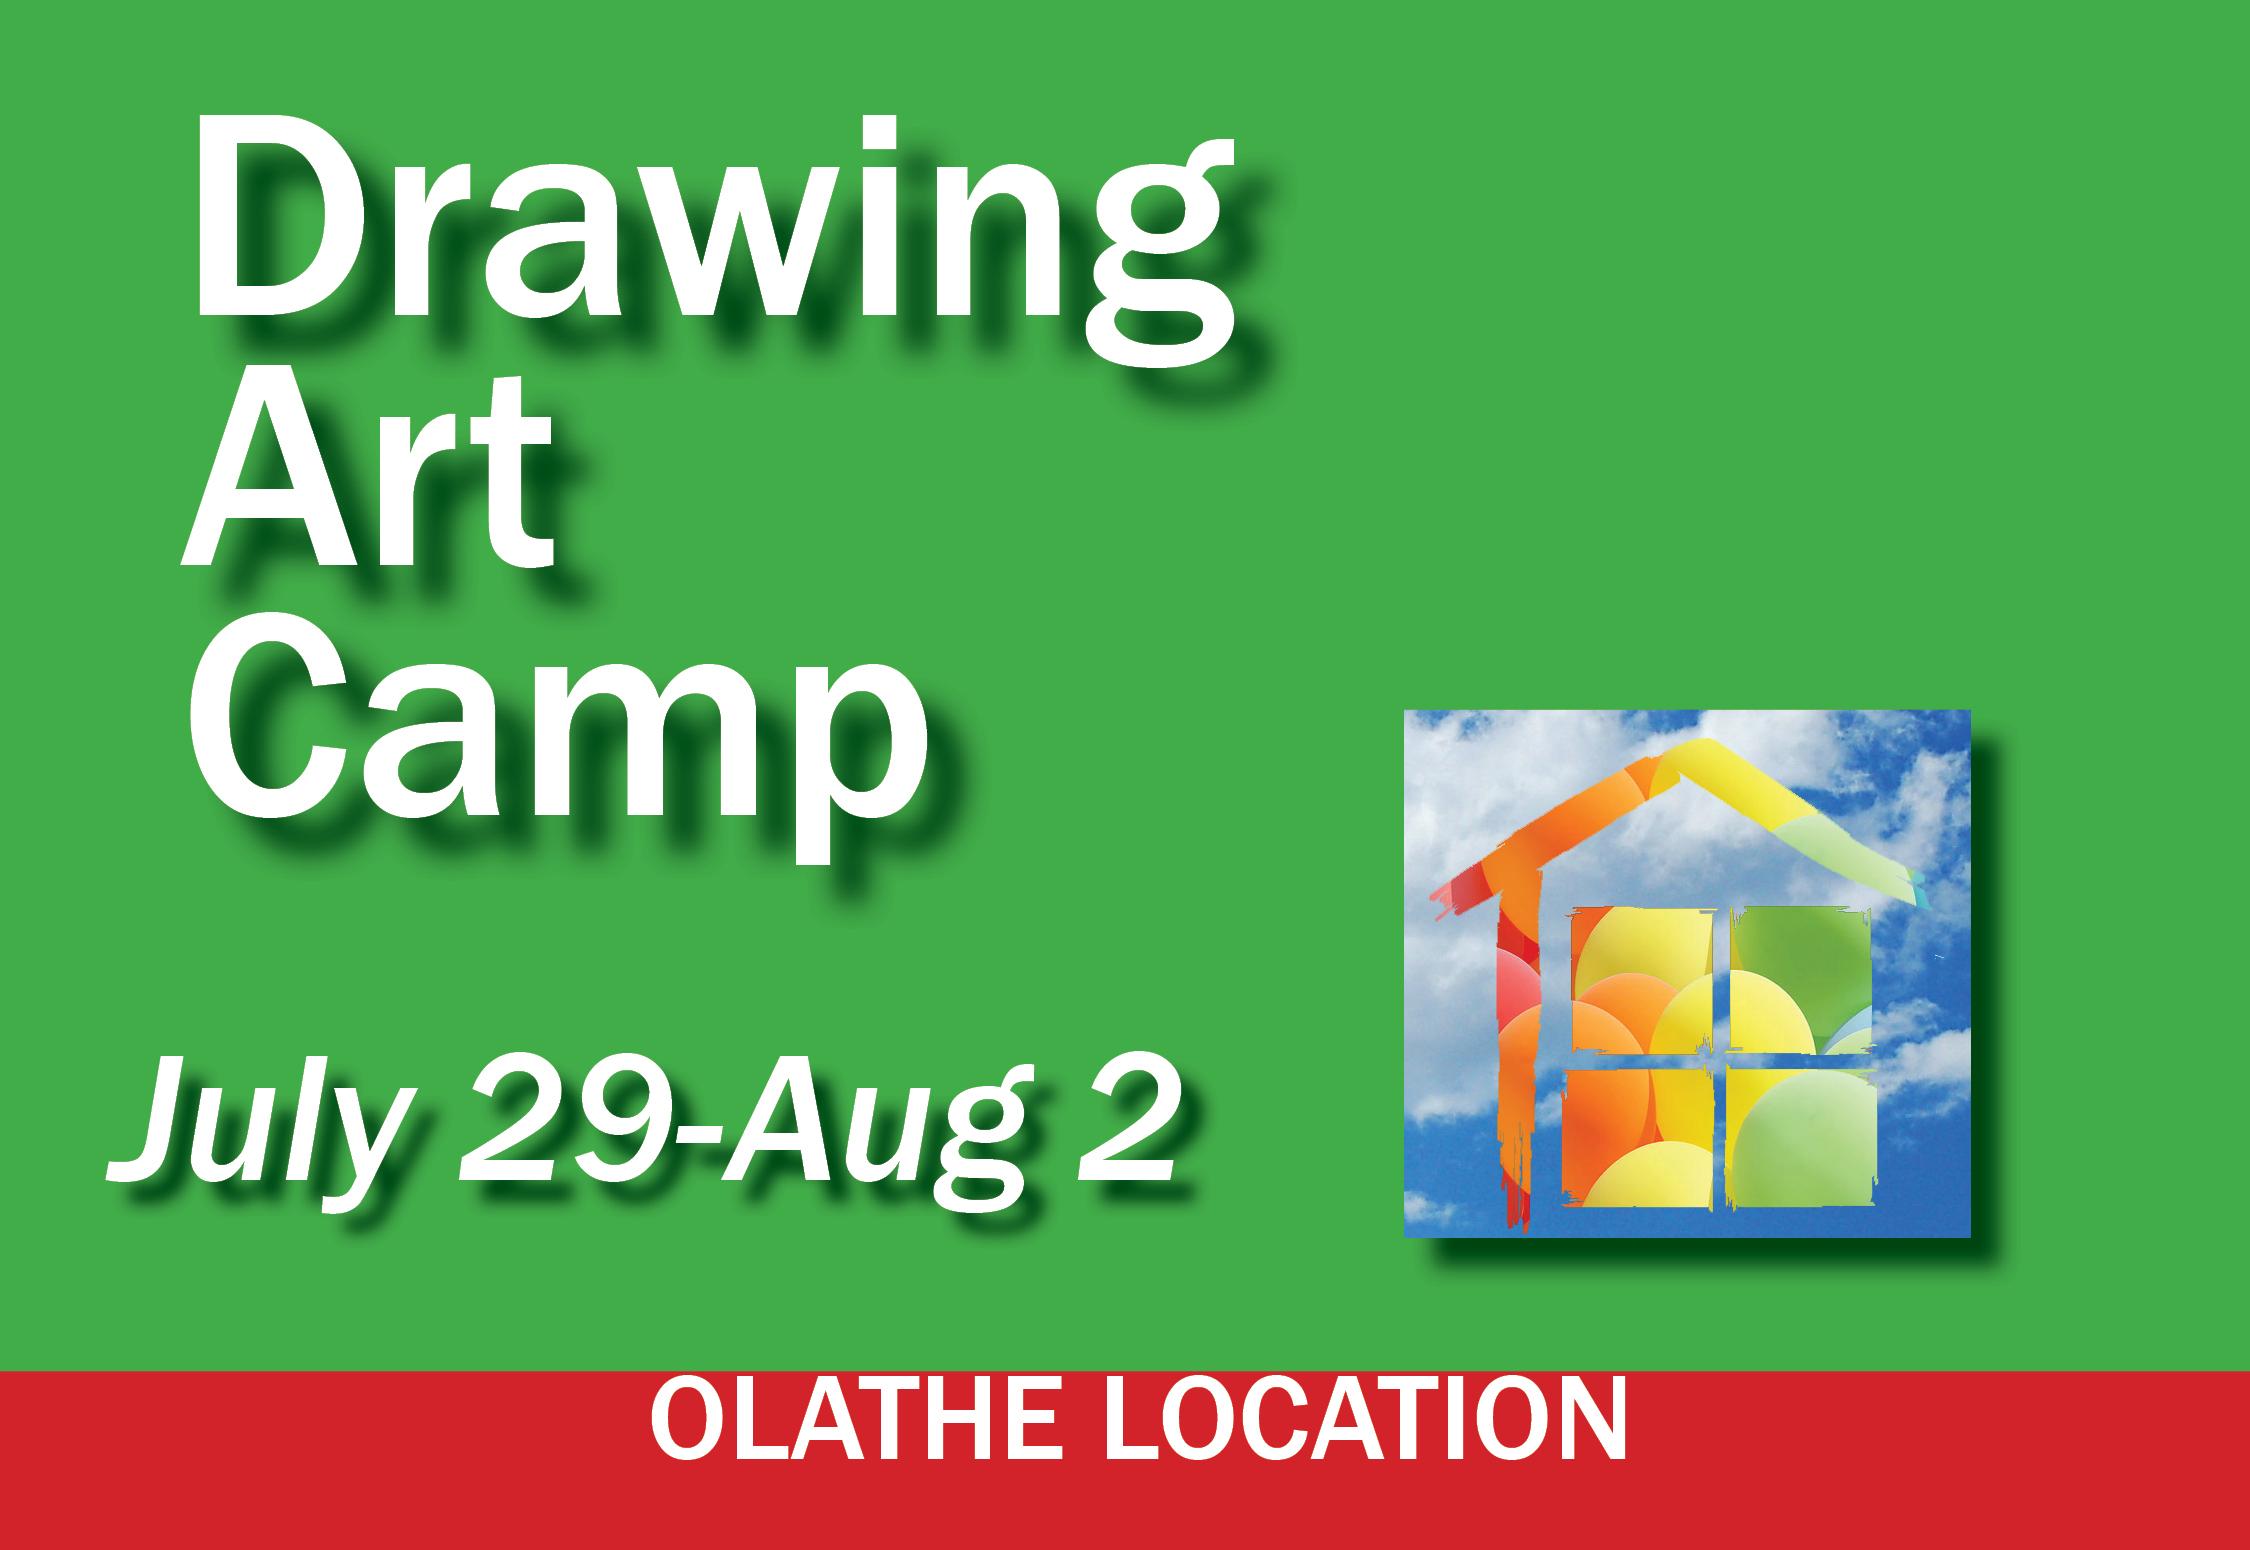 Drawing july 29.jpg